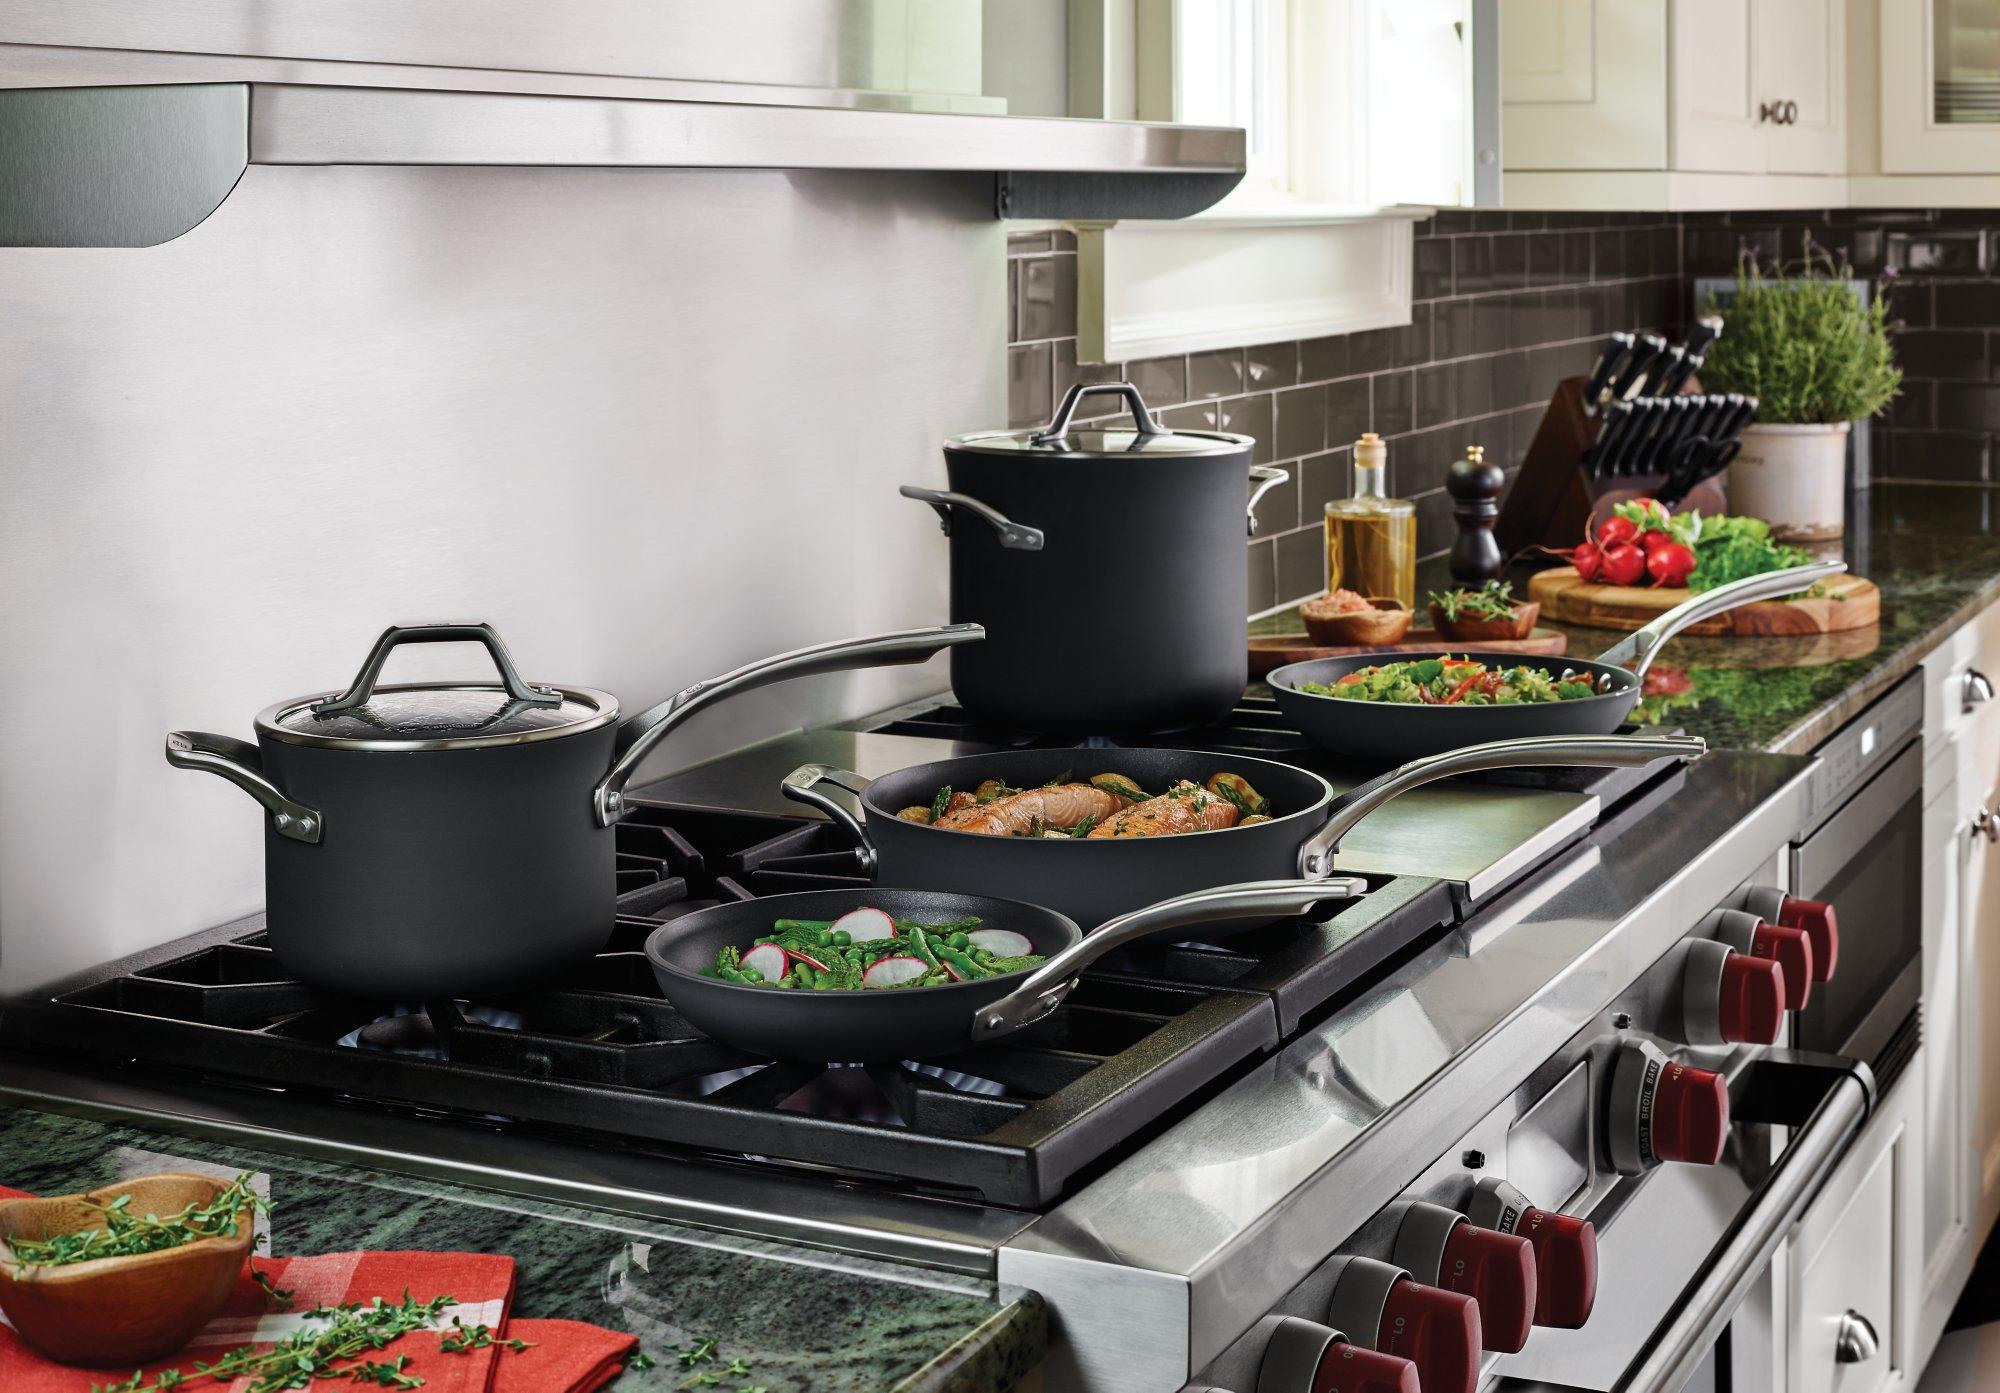 calphalon kitchen essentials scrub brush cookware cutlery bakeware kitchenware and more